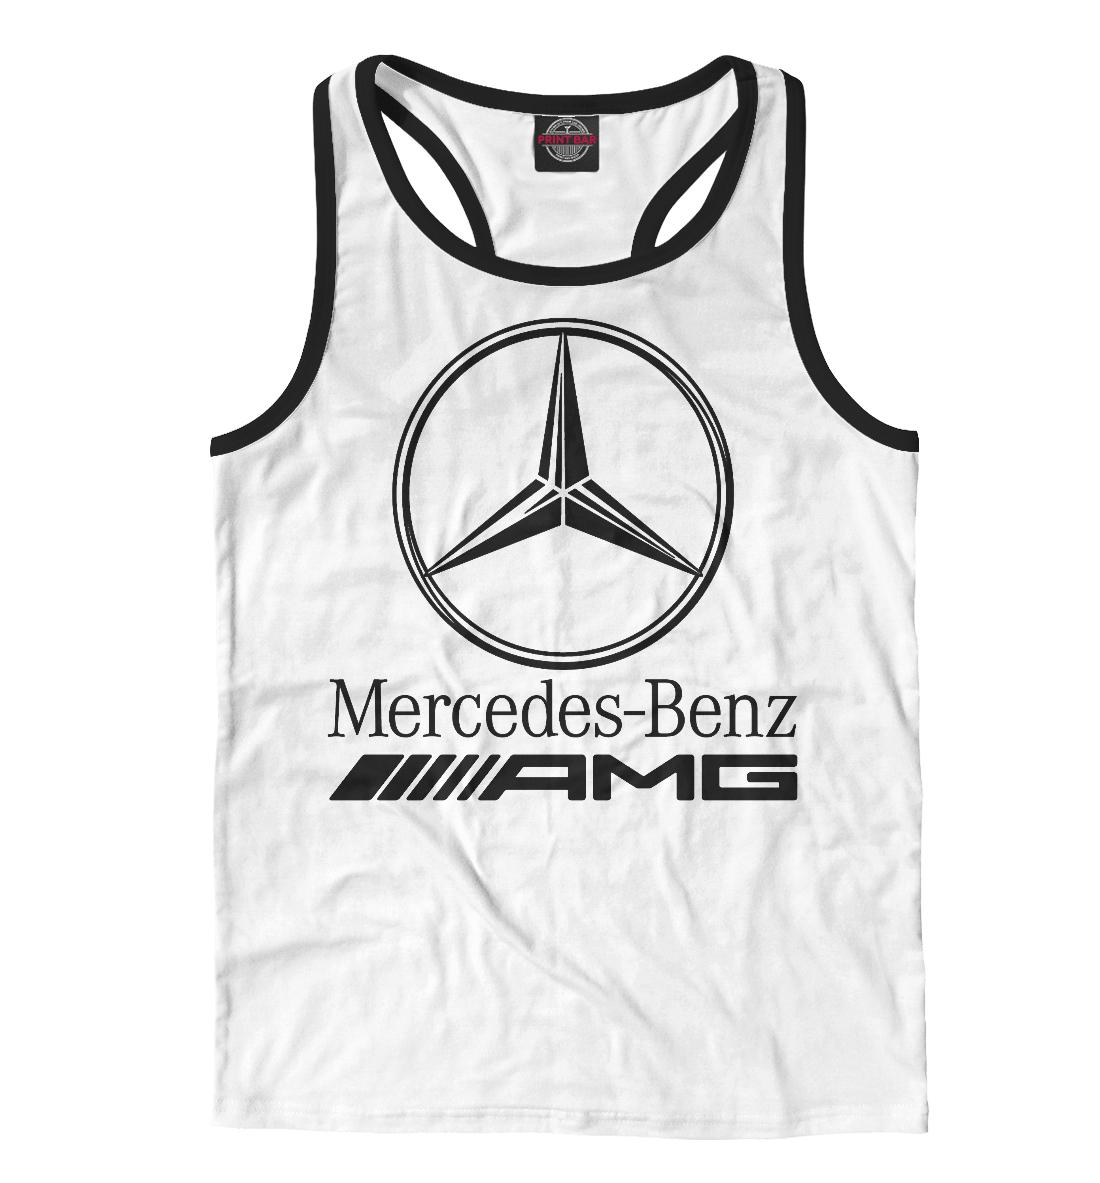 Mercedes-Benz AMG, Printbar, Майки борцовки, MER-912174-mayb-2  - купить со скидкой